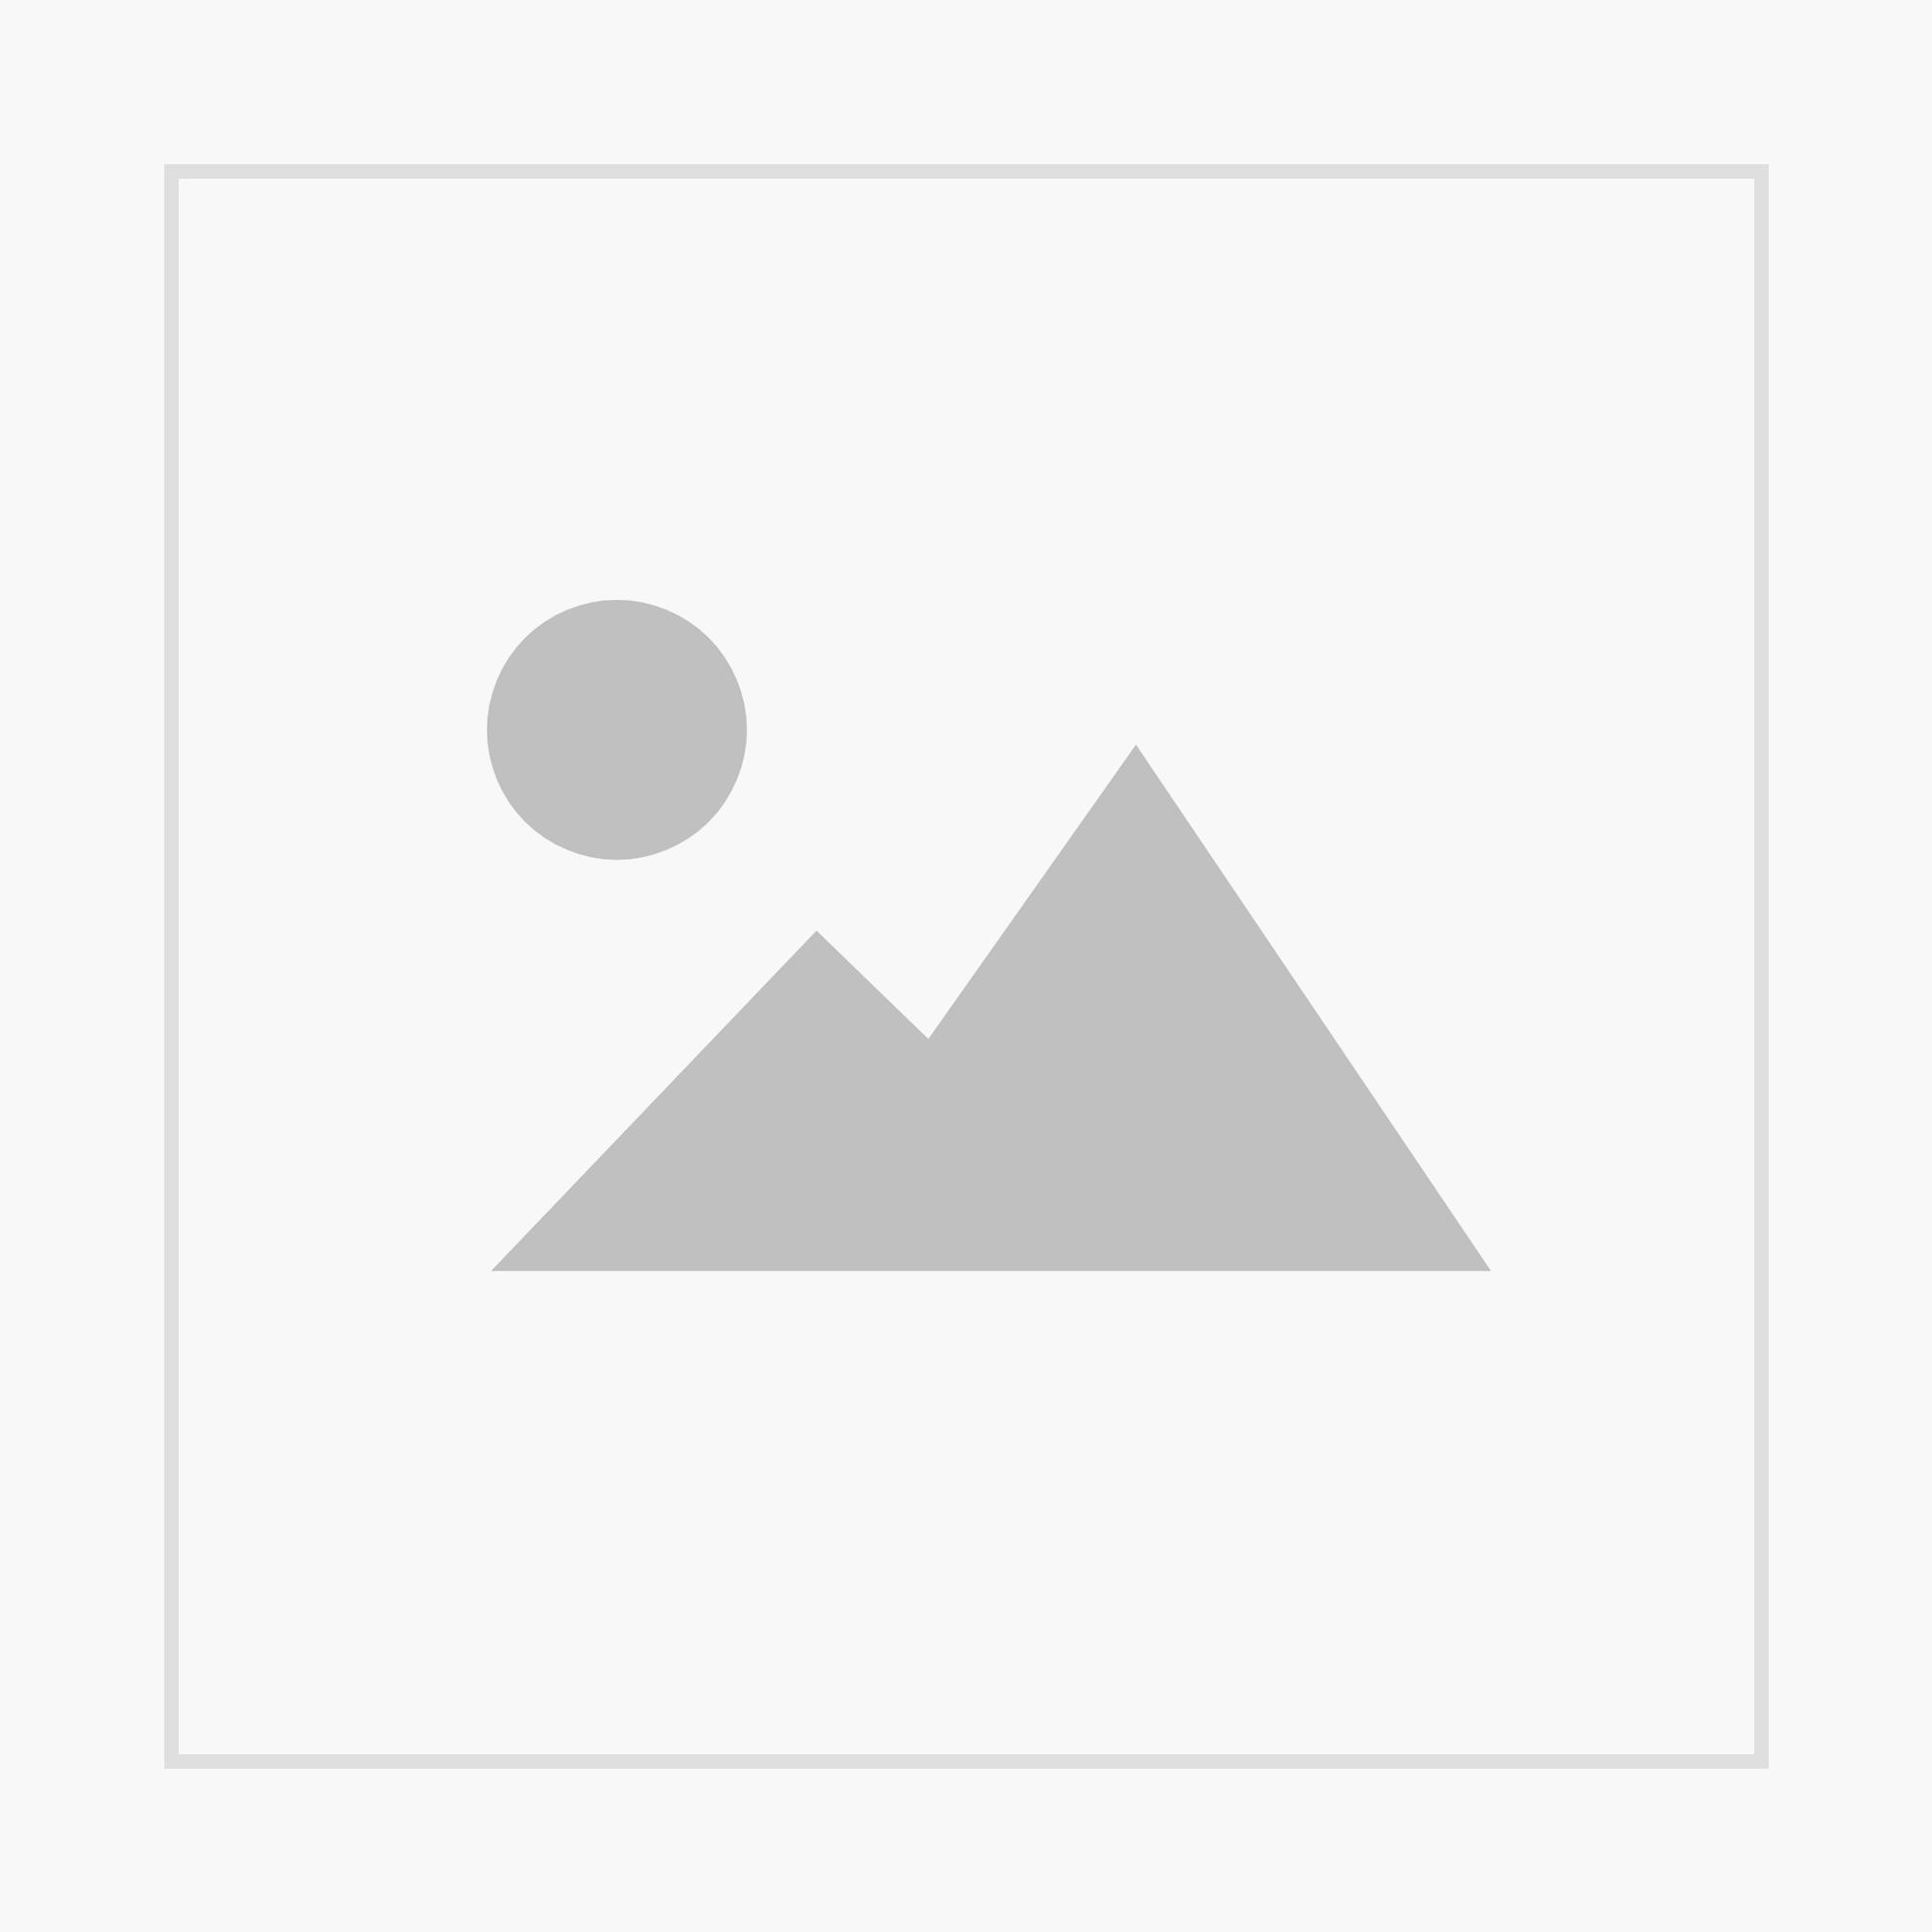 LuN Heft 59: Laufkäfer (Col.: Carabidae) im Drachenfelser Ländchen